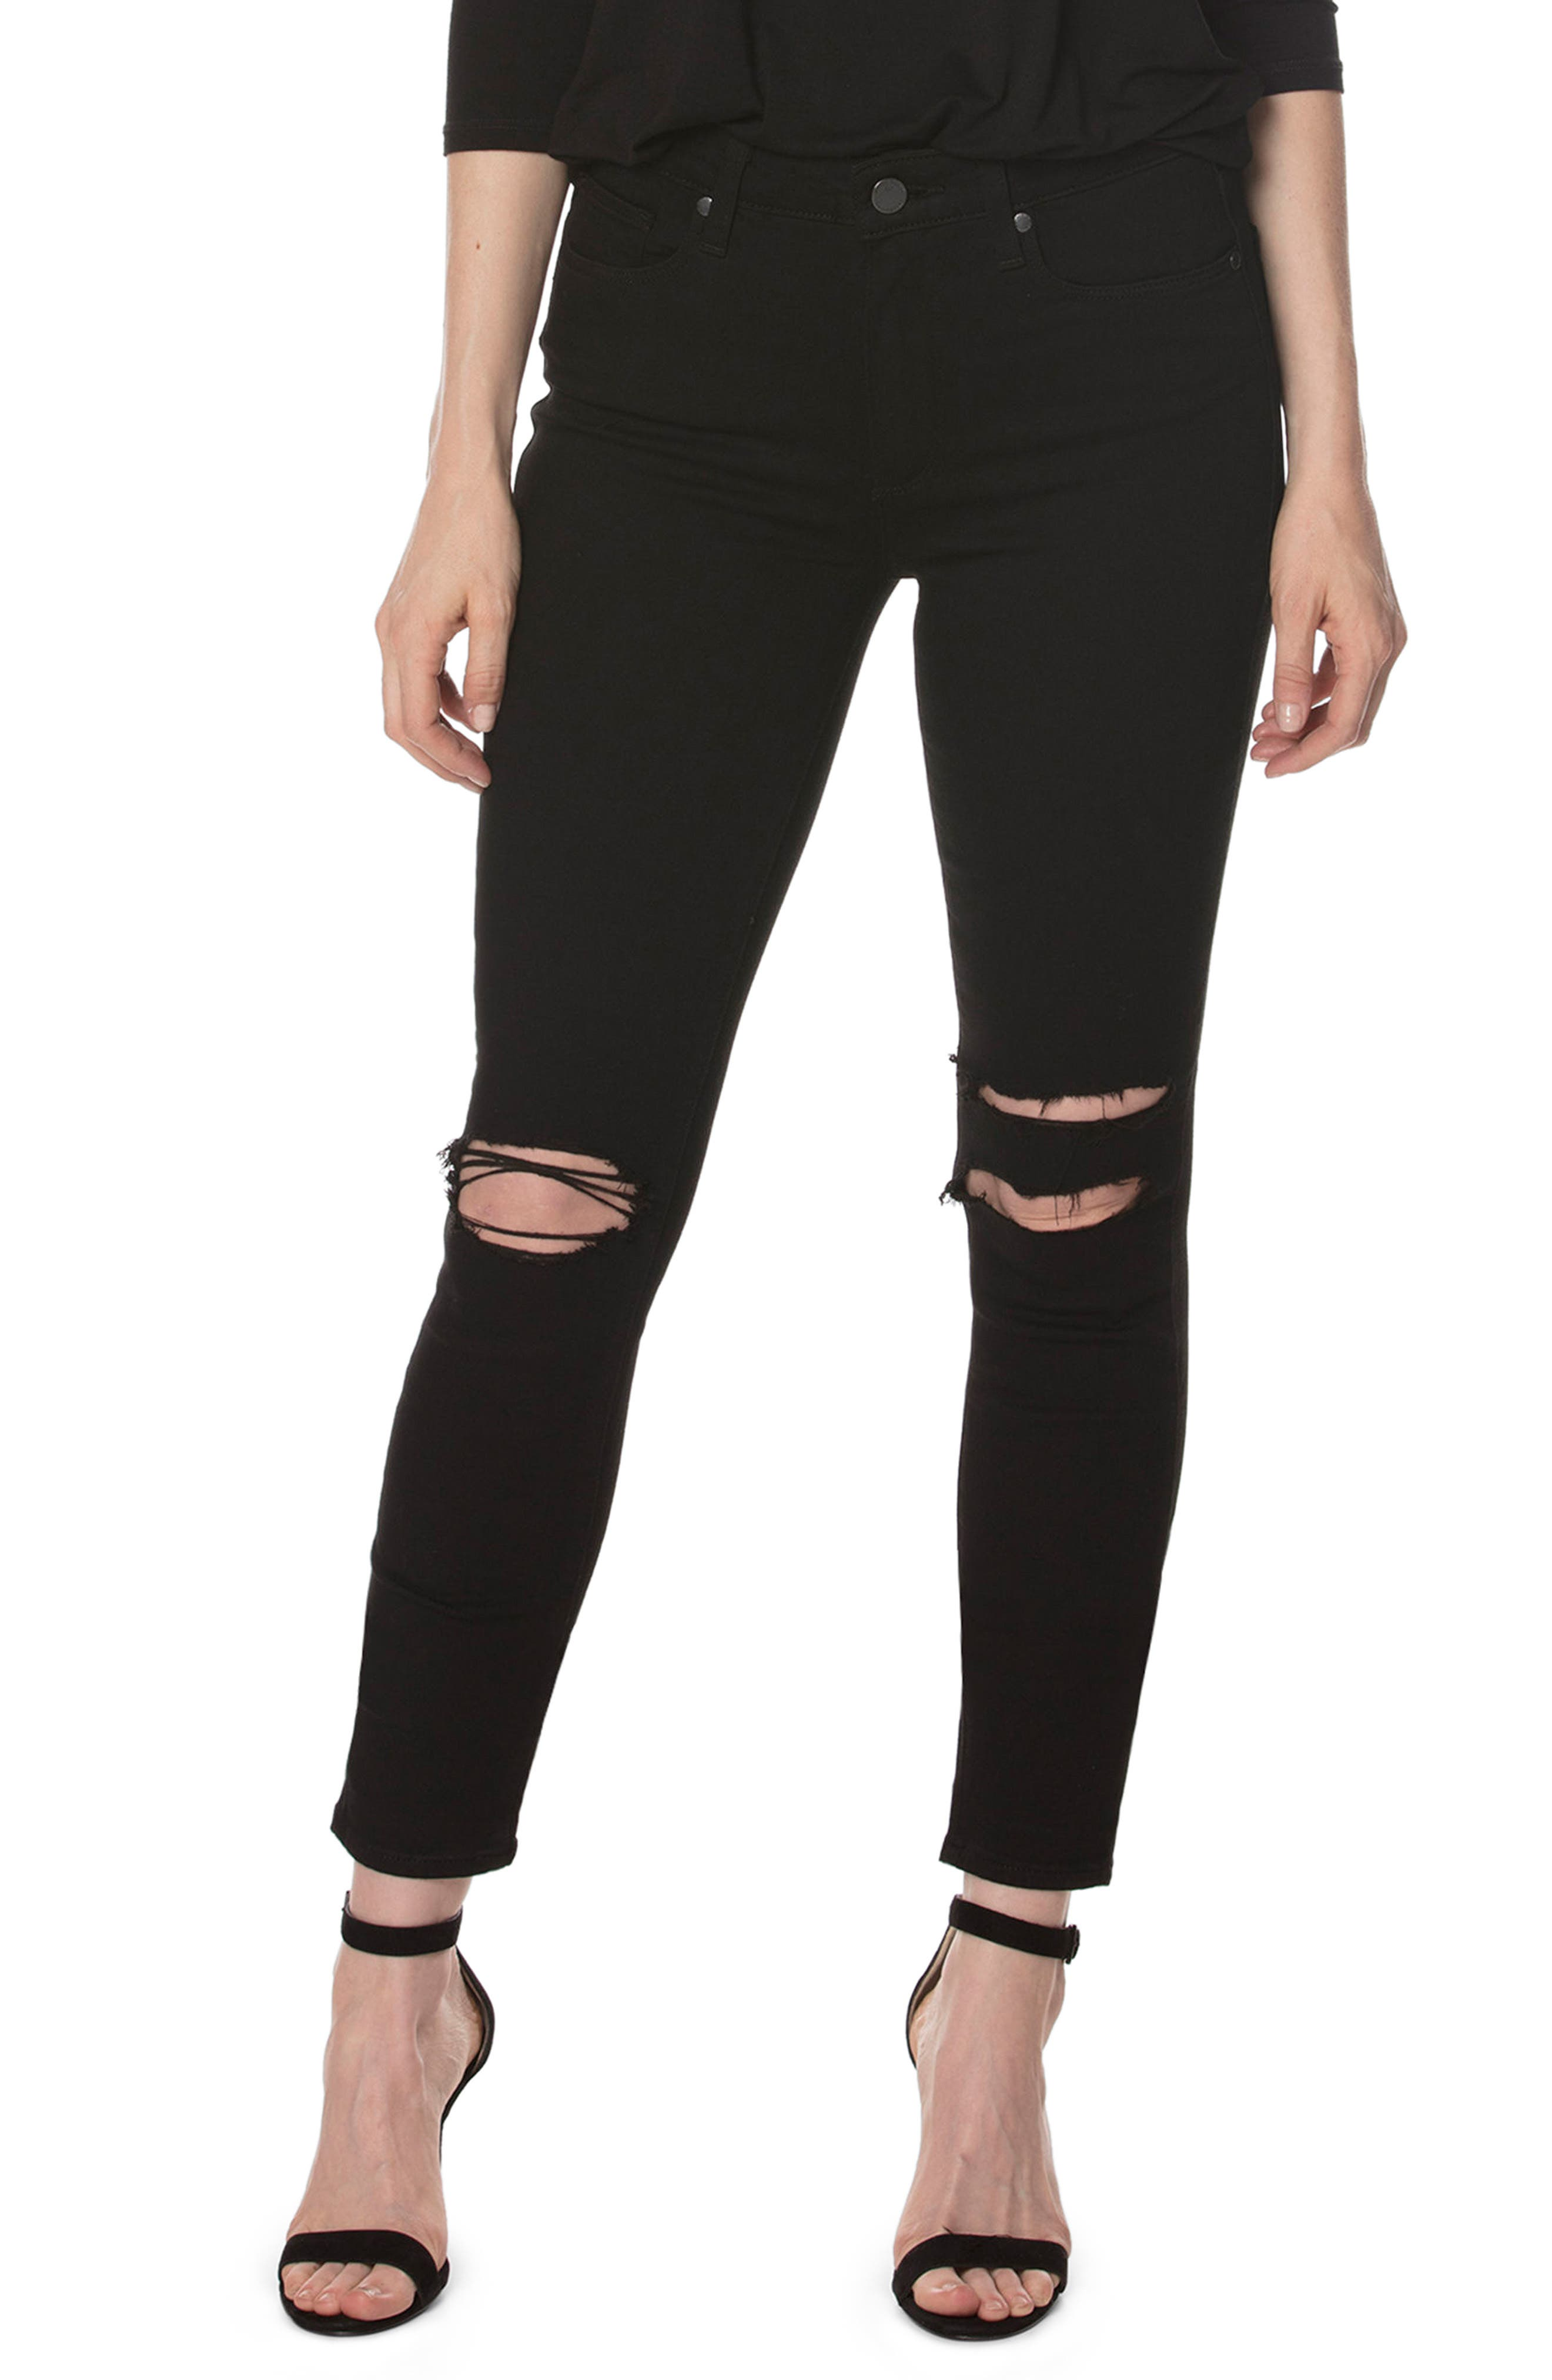 PAIGE, Transcend - Hoxton Skinny Ankle Jeans, Main thumbnail 1, color, 001